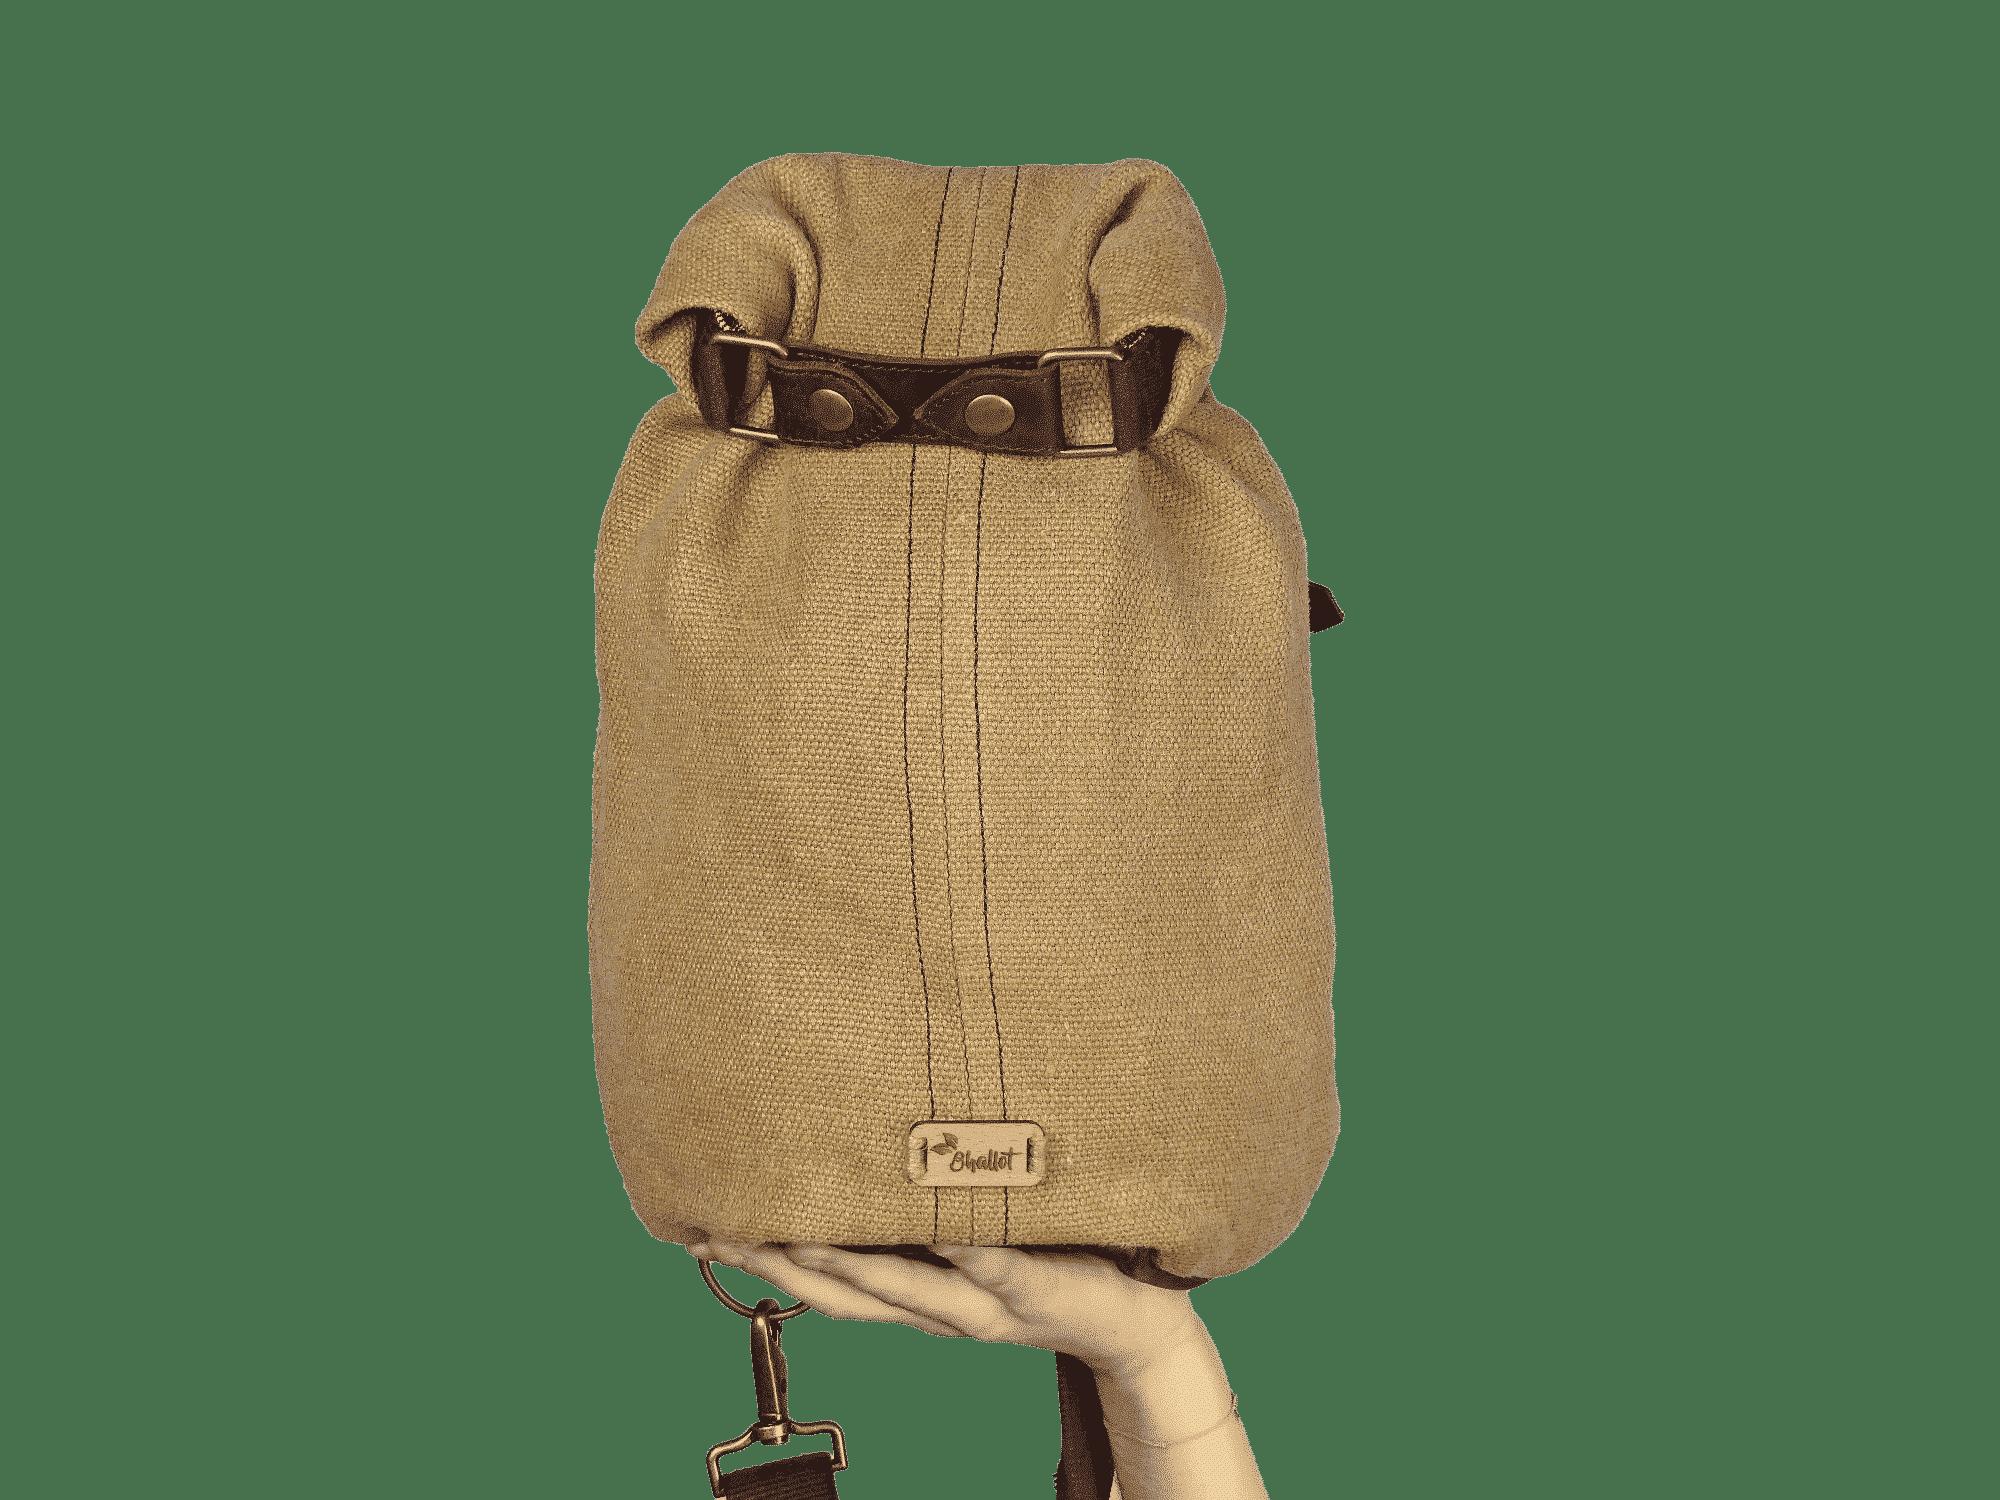 Bhallot - Petit sac à dos bandoulière - balish